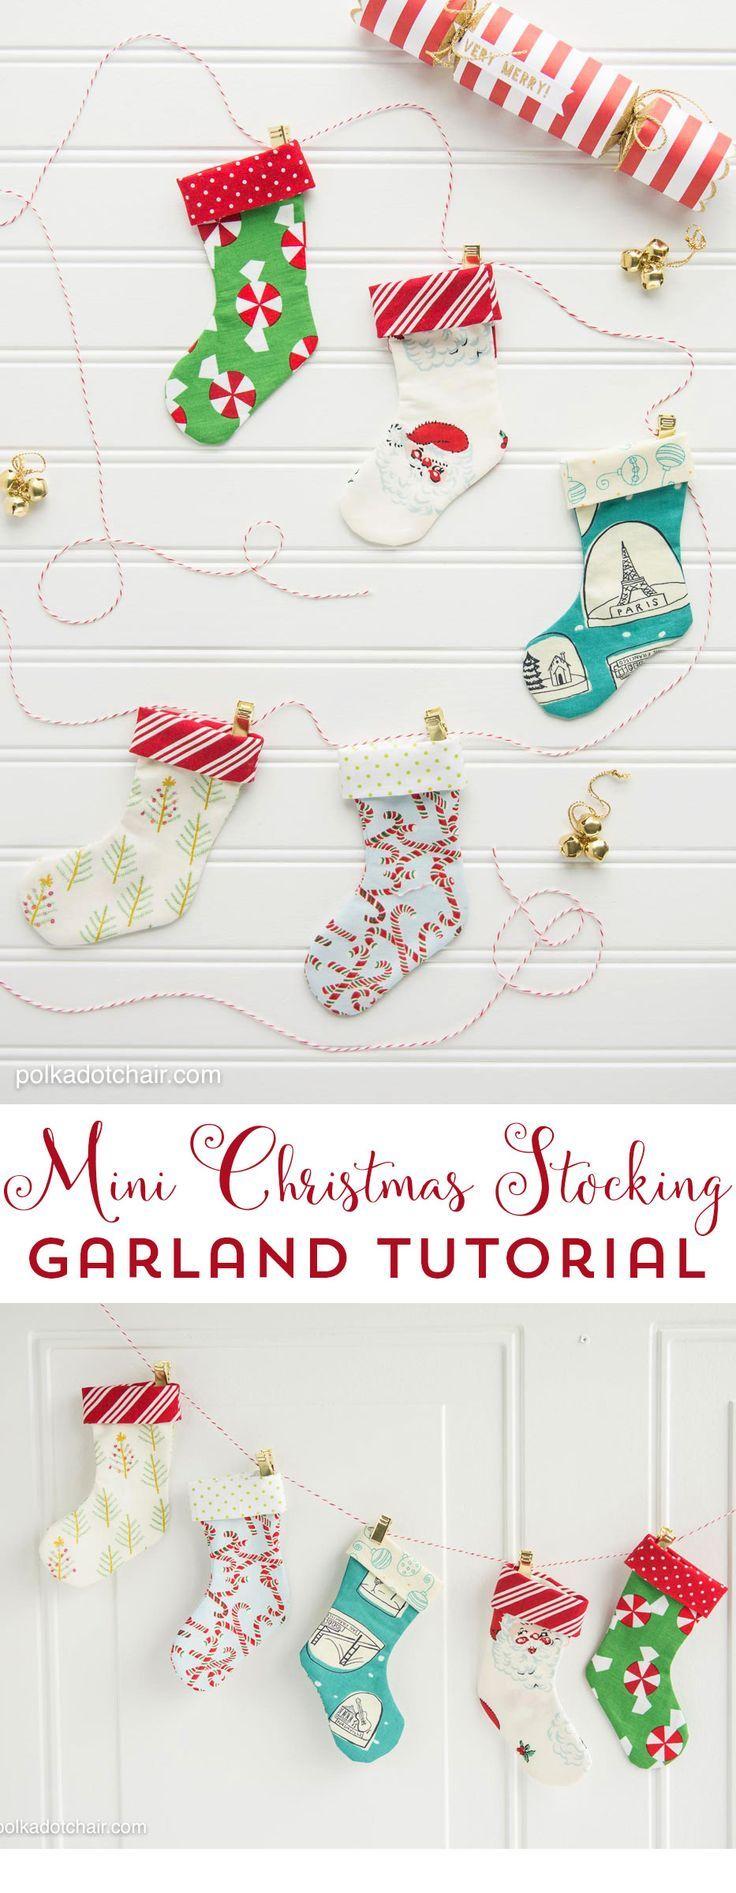 Mini Christmas Stocking Garland Sewing tutorial by Melissa of http://polkadotchair.com